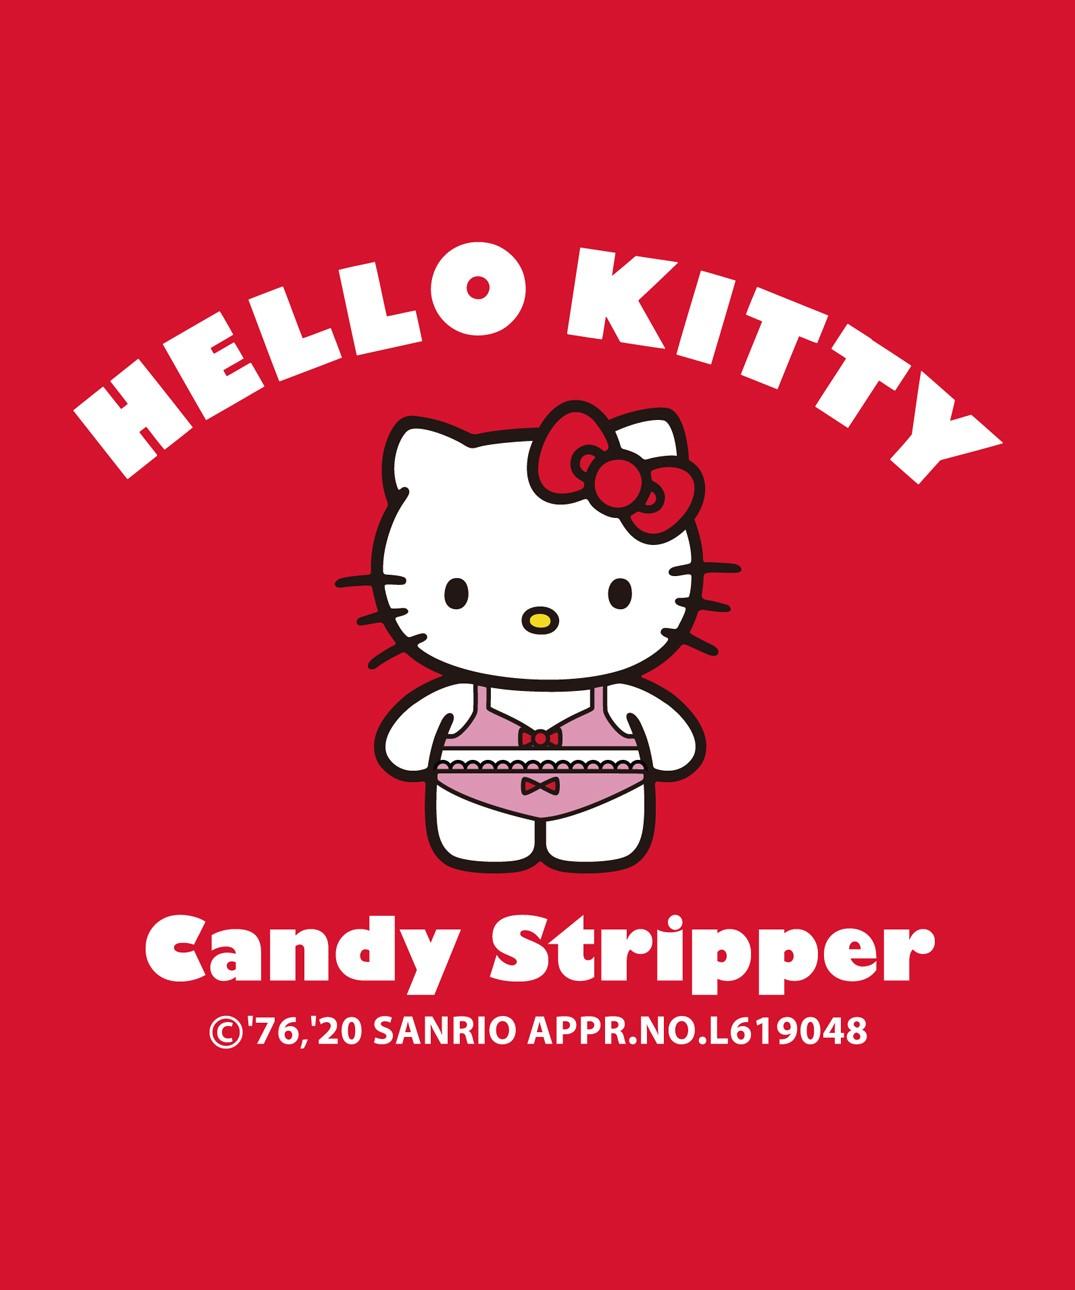 Candy Stripper(キャンディストリッパー )のショップニュース「【HELLO KITTY×Candy Stripper】コラボアイテム再オーダーSTART♡」